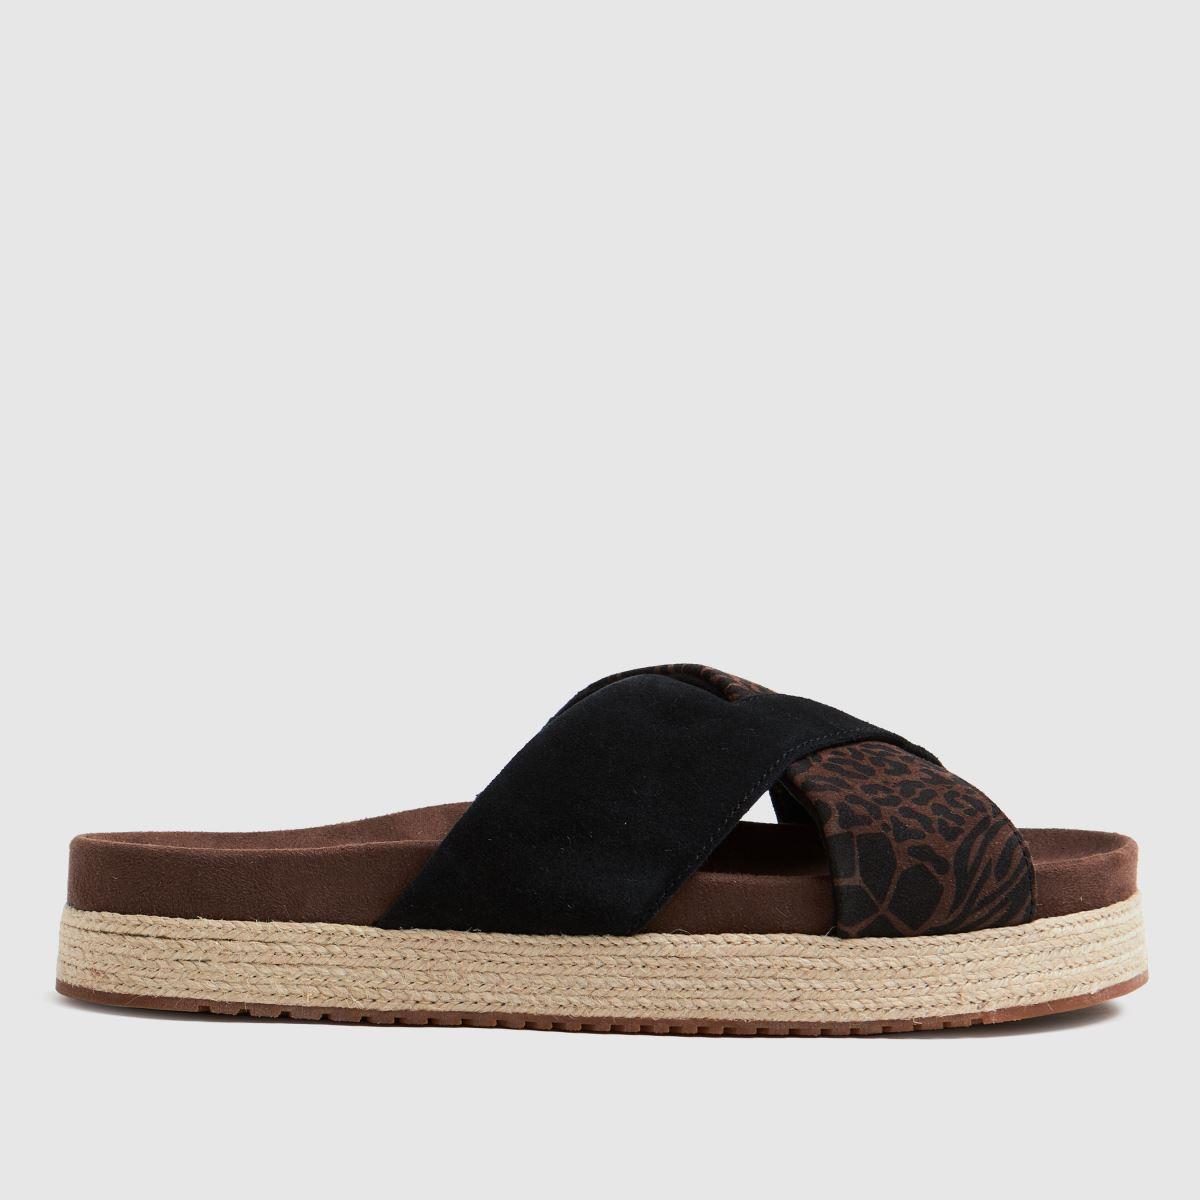 TOMS Black Paloma Sandals